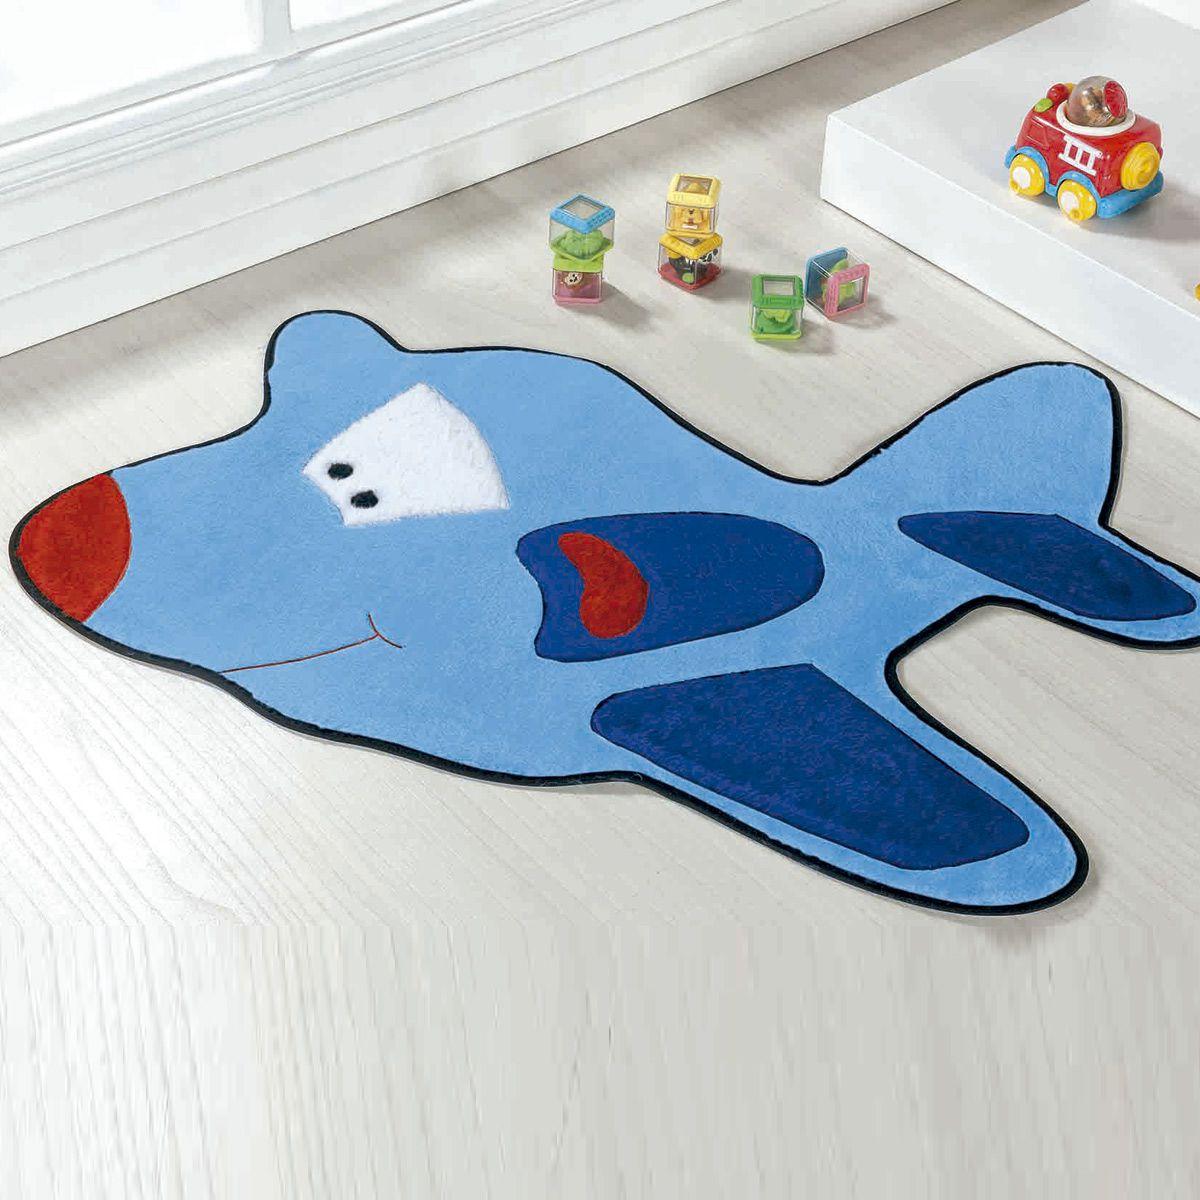 Tapete Infantil Premium Formato Avião Azul Turquesa 98cm x 68cm